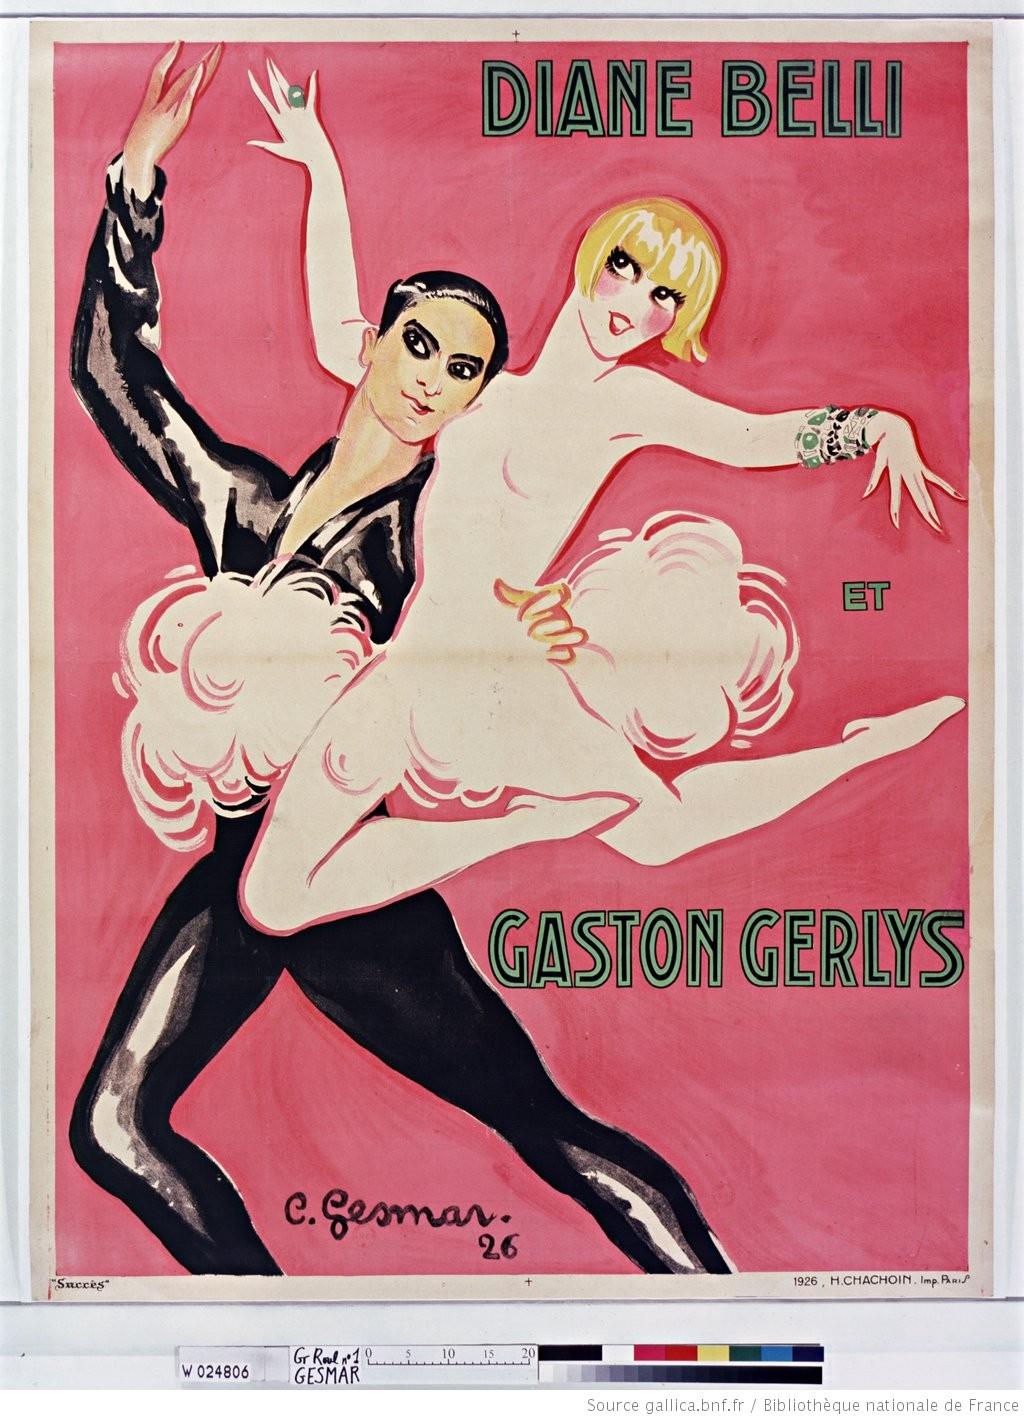 Diane Belli et Gaston Gerlys : [affiche] / [C. Gesmar]